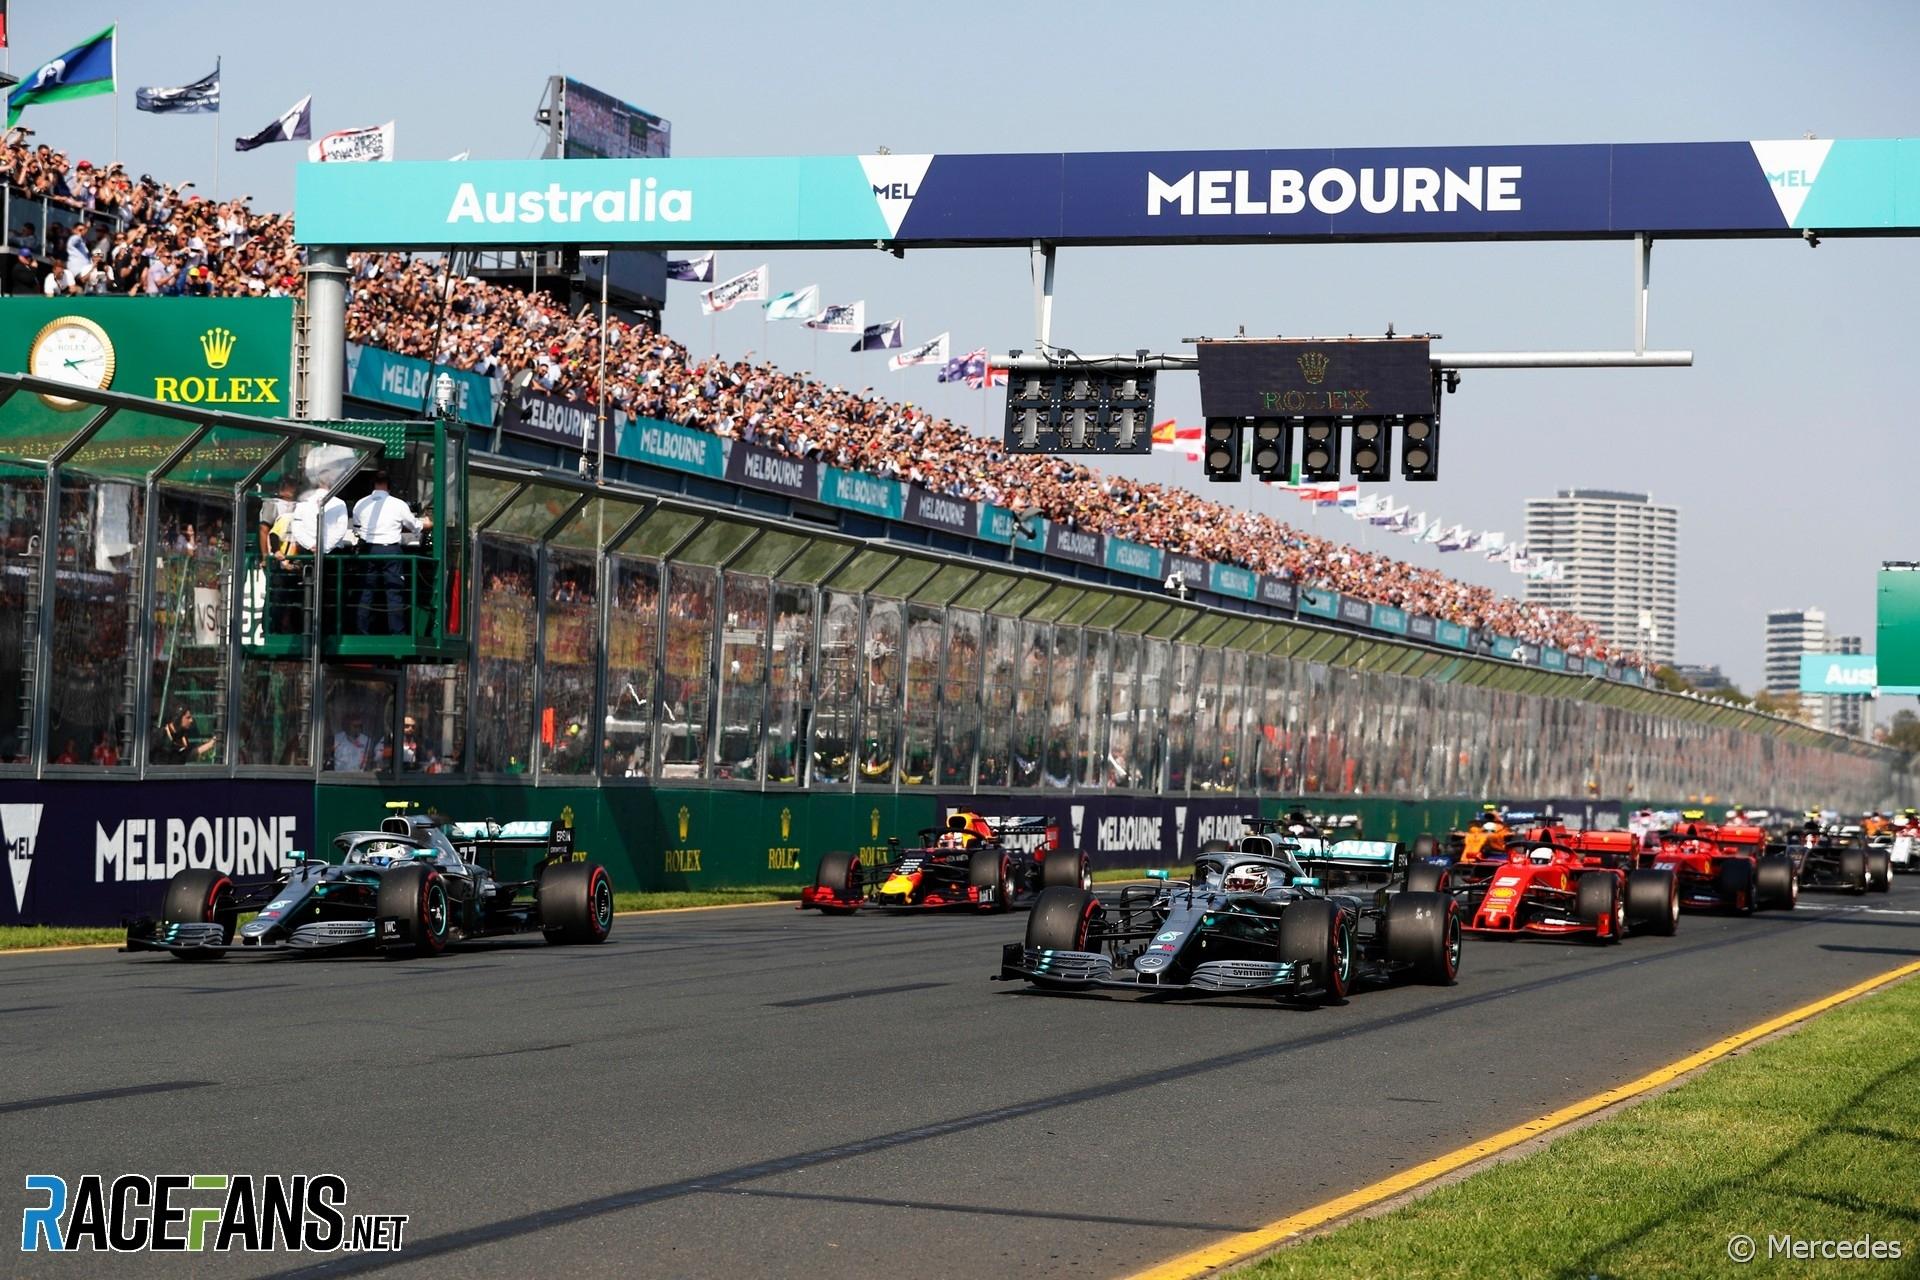 2019 F1 Calendar: Formula One Race Schedule - Racefans Printable 2020 Formula 1 Schedule